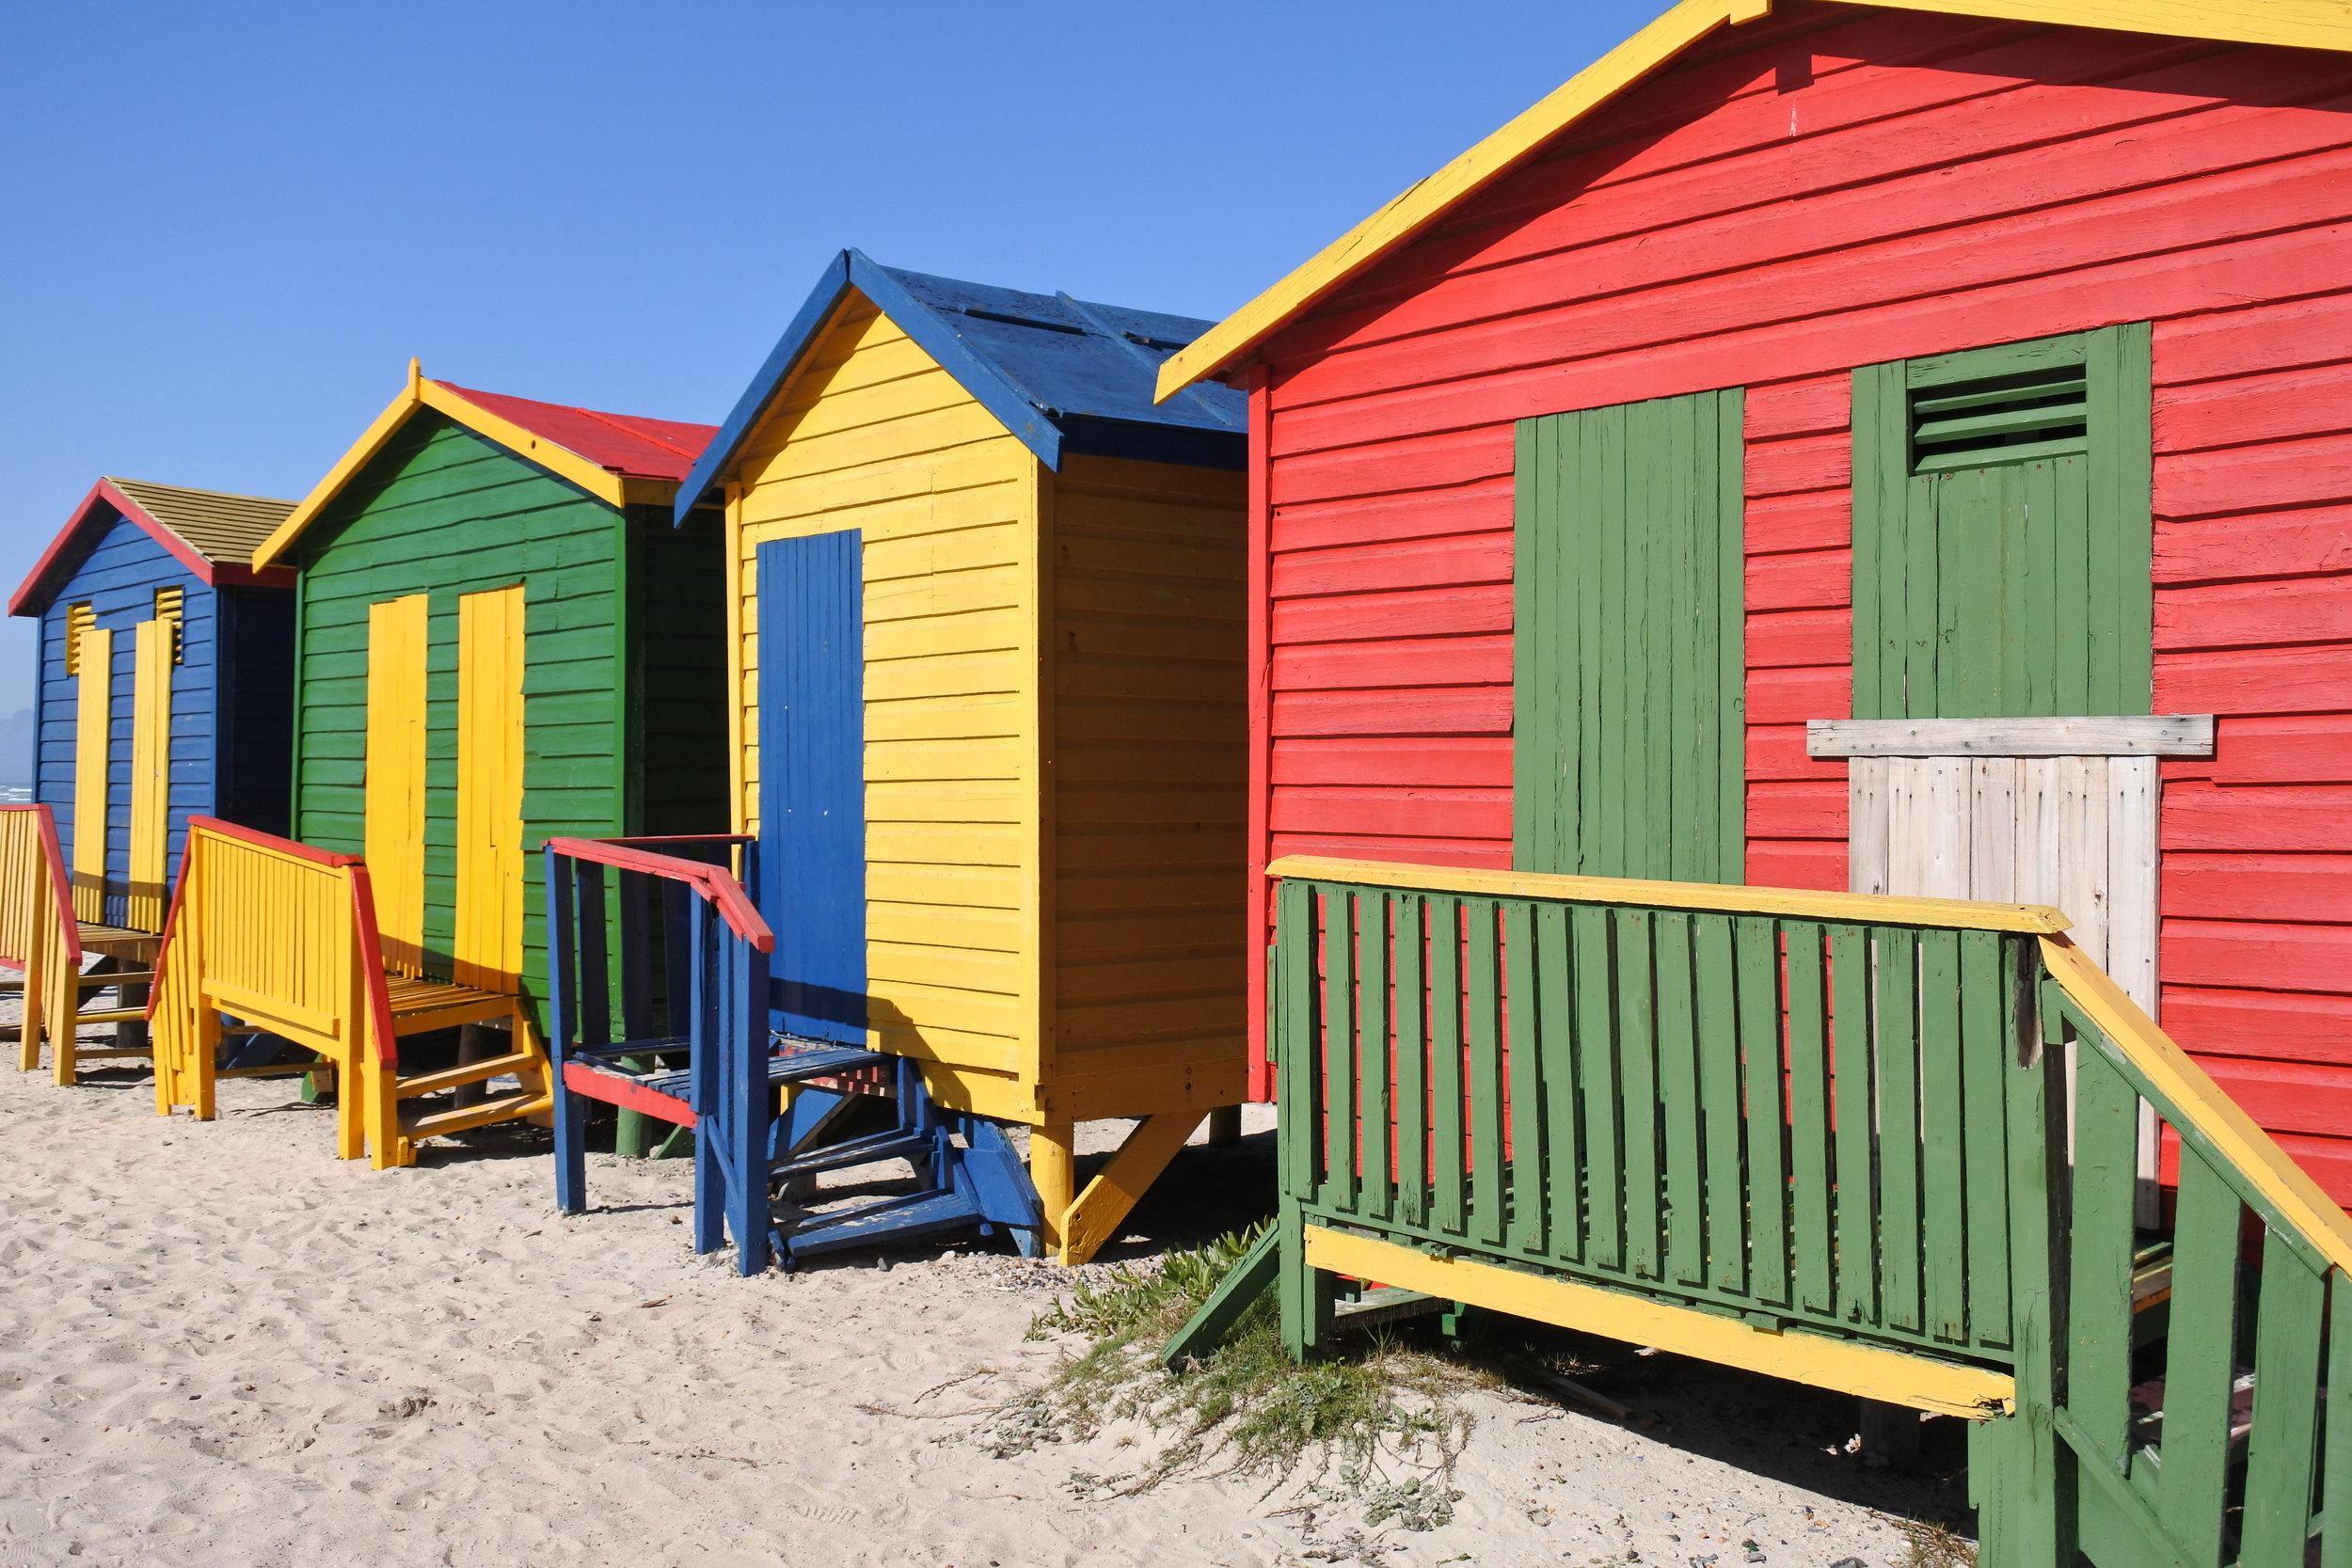 Beach Houses at Muizenberg